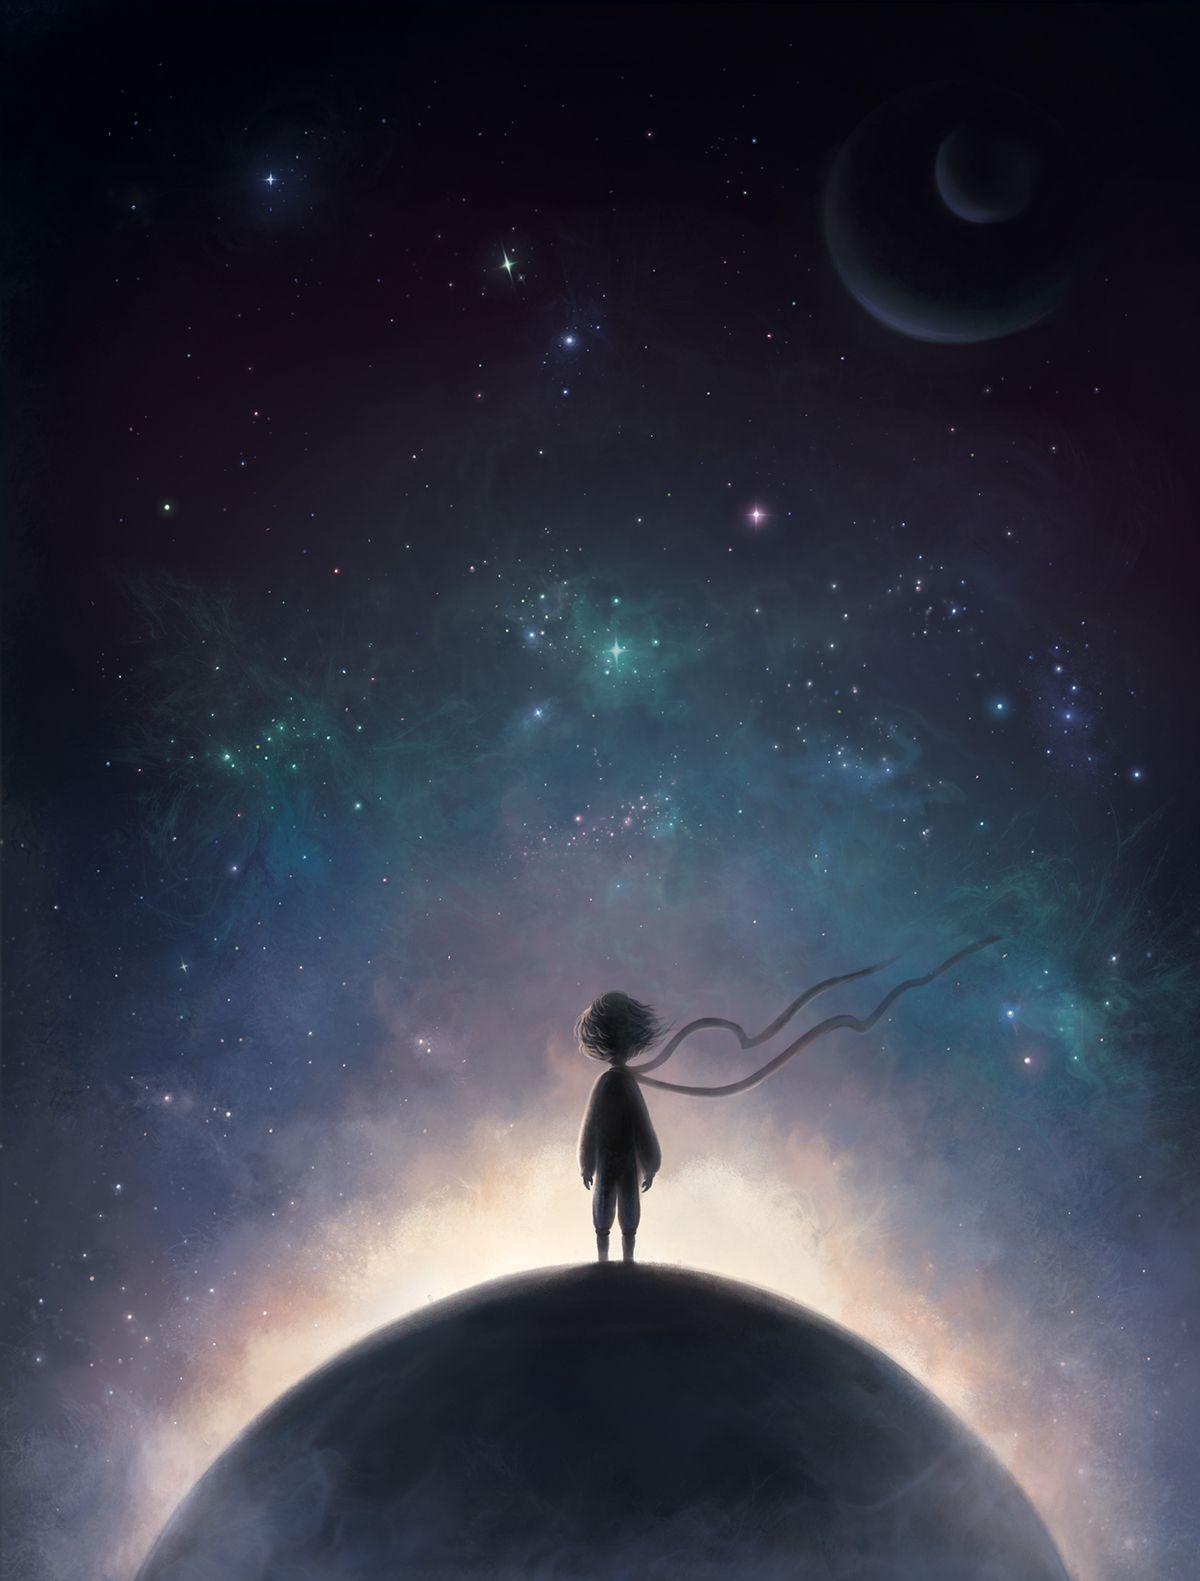 Deep House Girl Wallpaper The Little Prince Illustrations By Ann Baratashvili Part